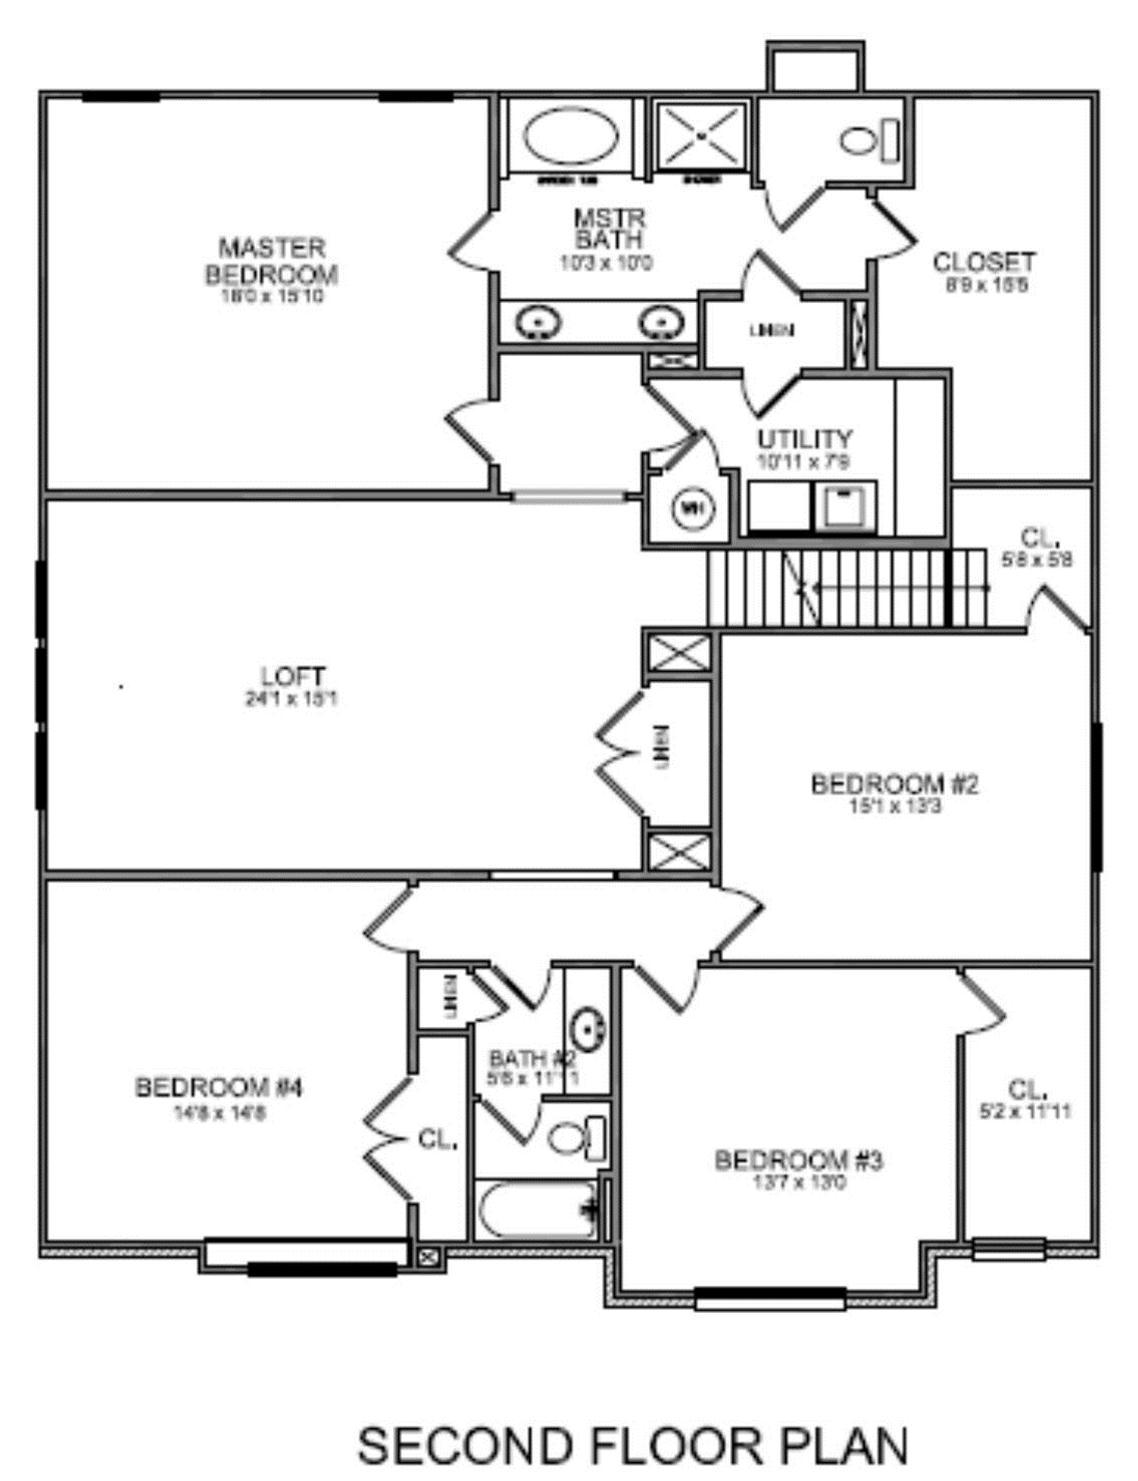 Upstairs Master Bathroom Floor Plans With Walk In Closet